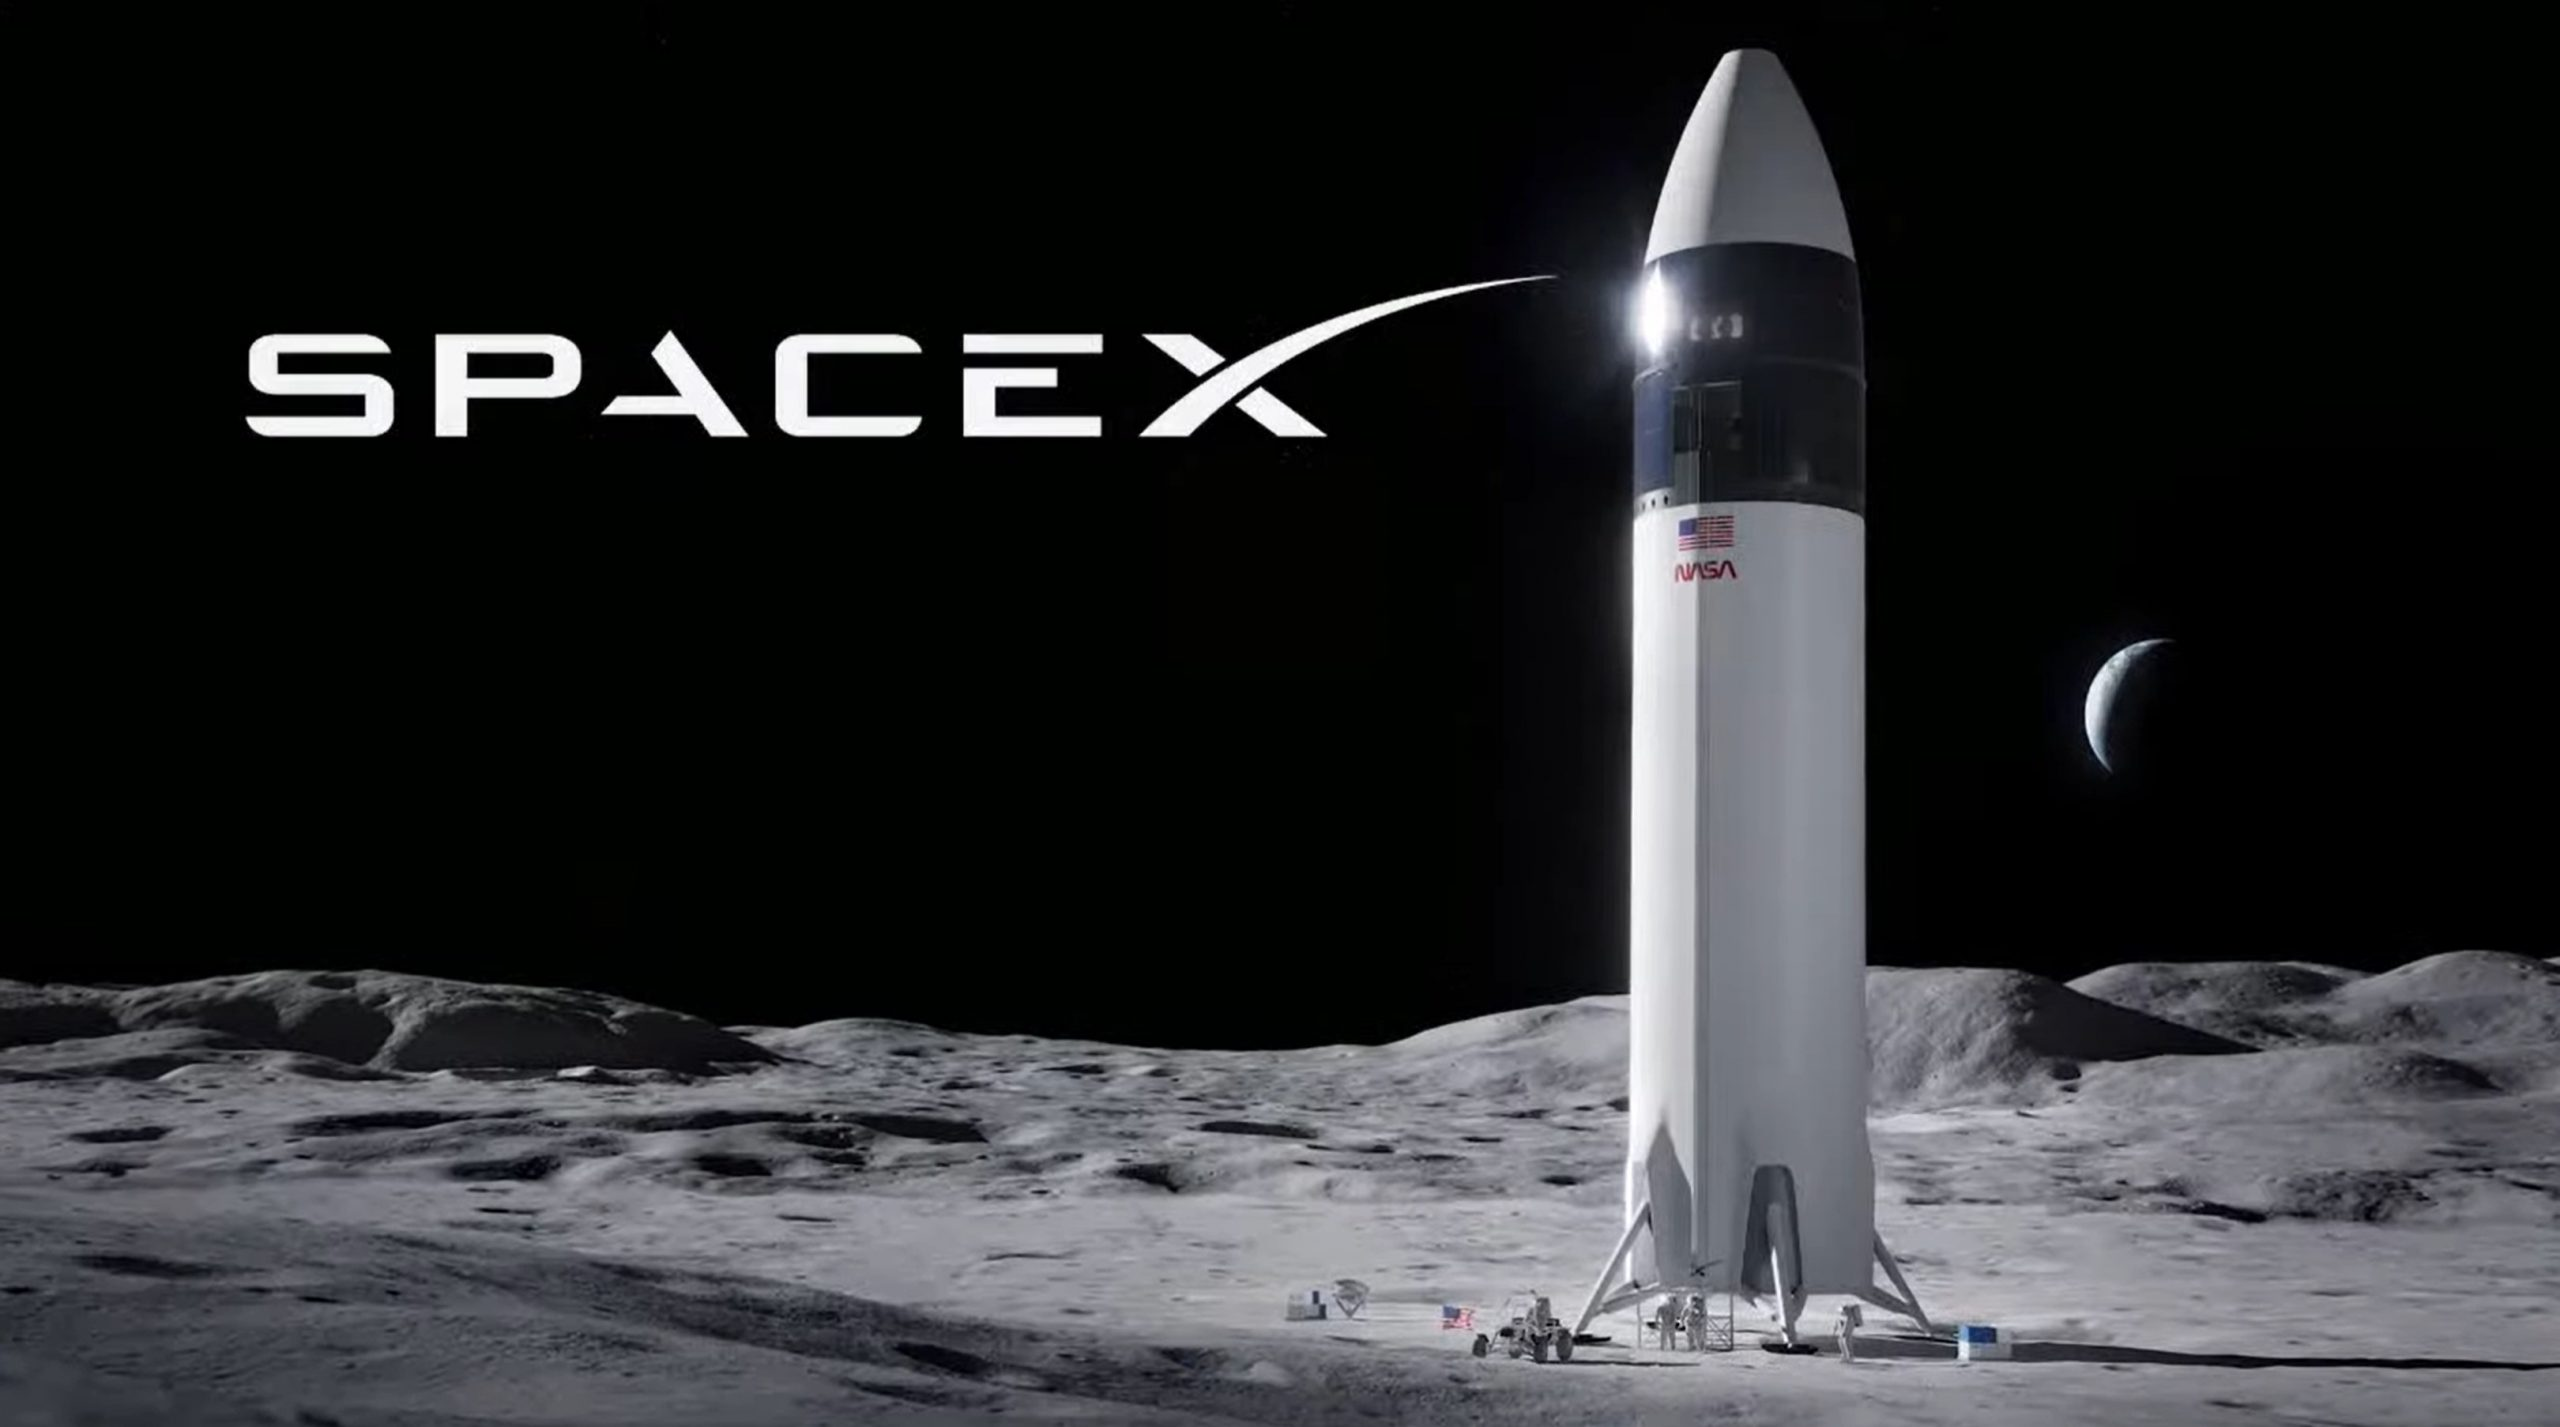 Lunar Starship Artemis (SpaceX) 2021 render 1